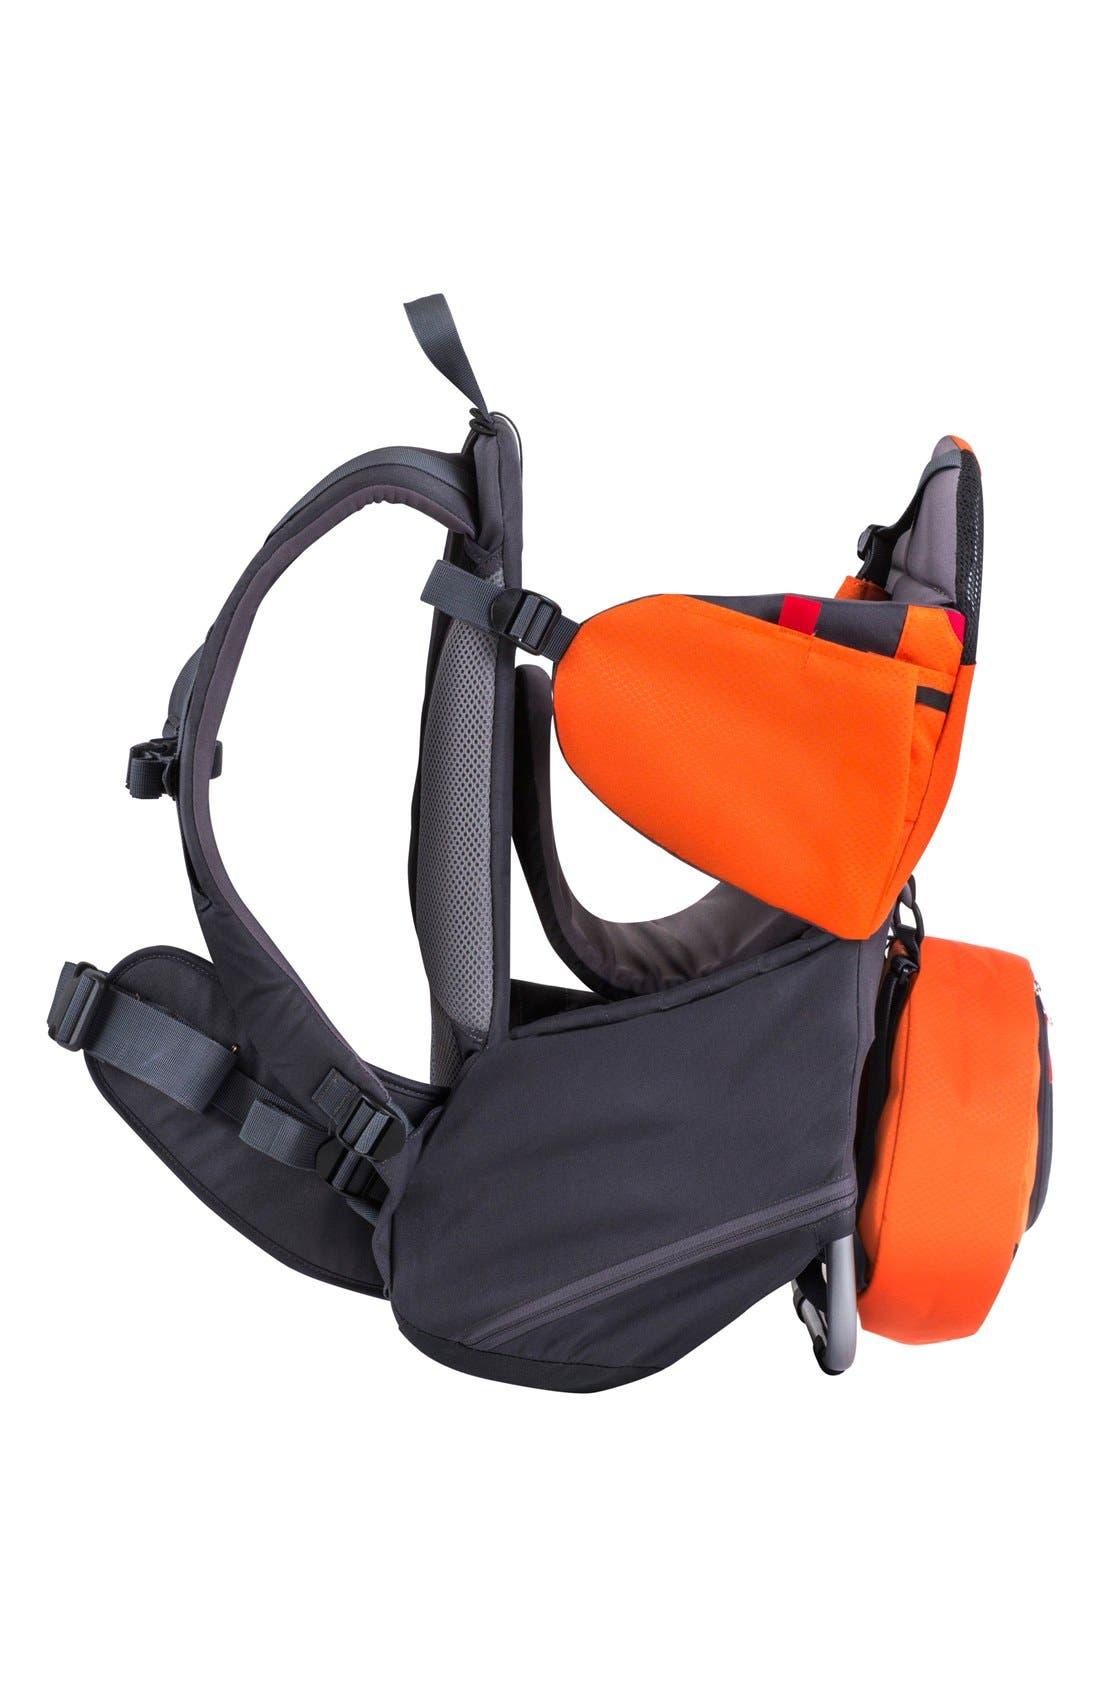 'Parade' Backpack Carrier,                             Alternate thumbnail 4, color,                             Orange/ Grey